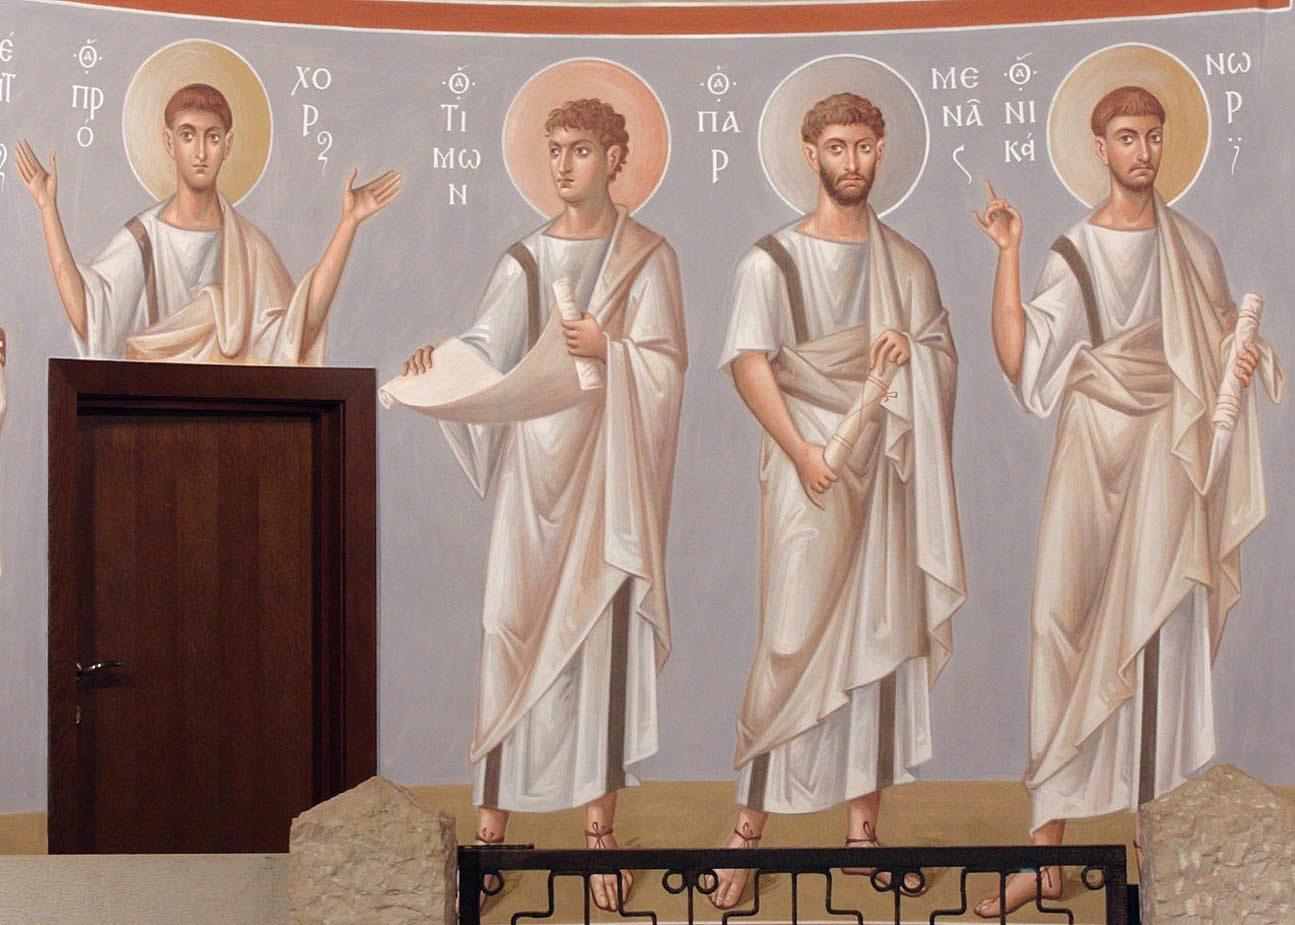 Святые Апостолы от 70 Прохор, Тимон, Пармен, Никанор. Фреска архимандрита Зинона.